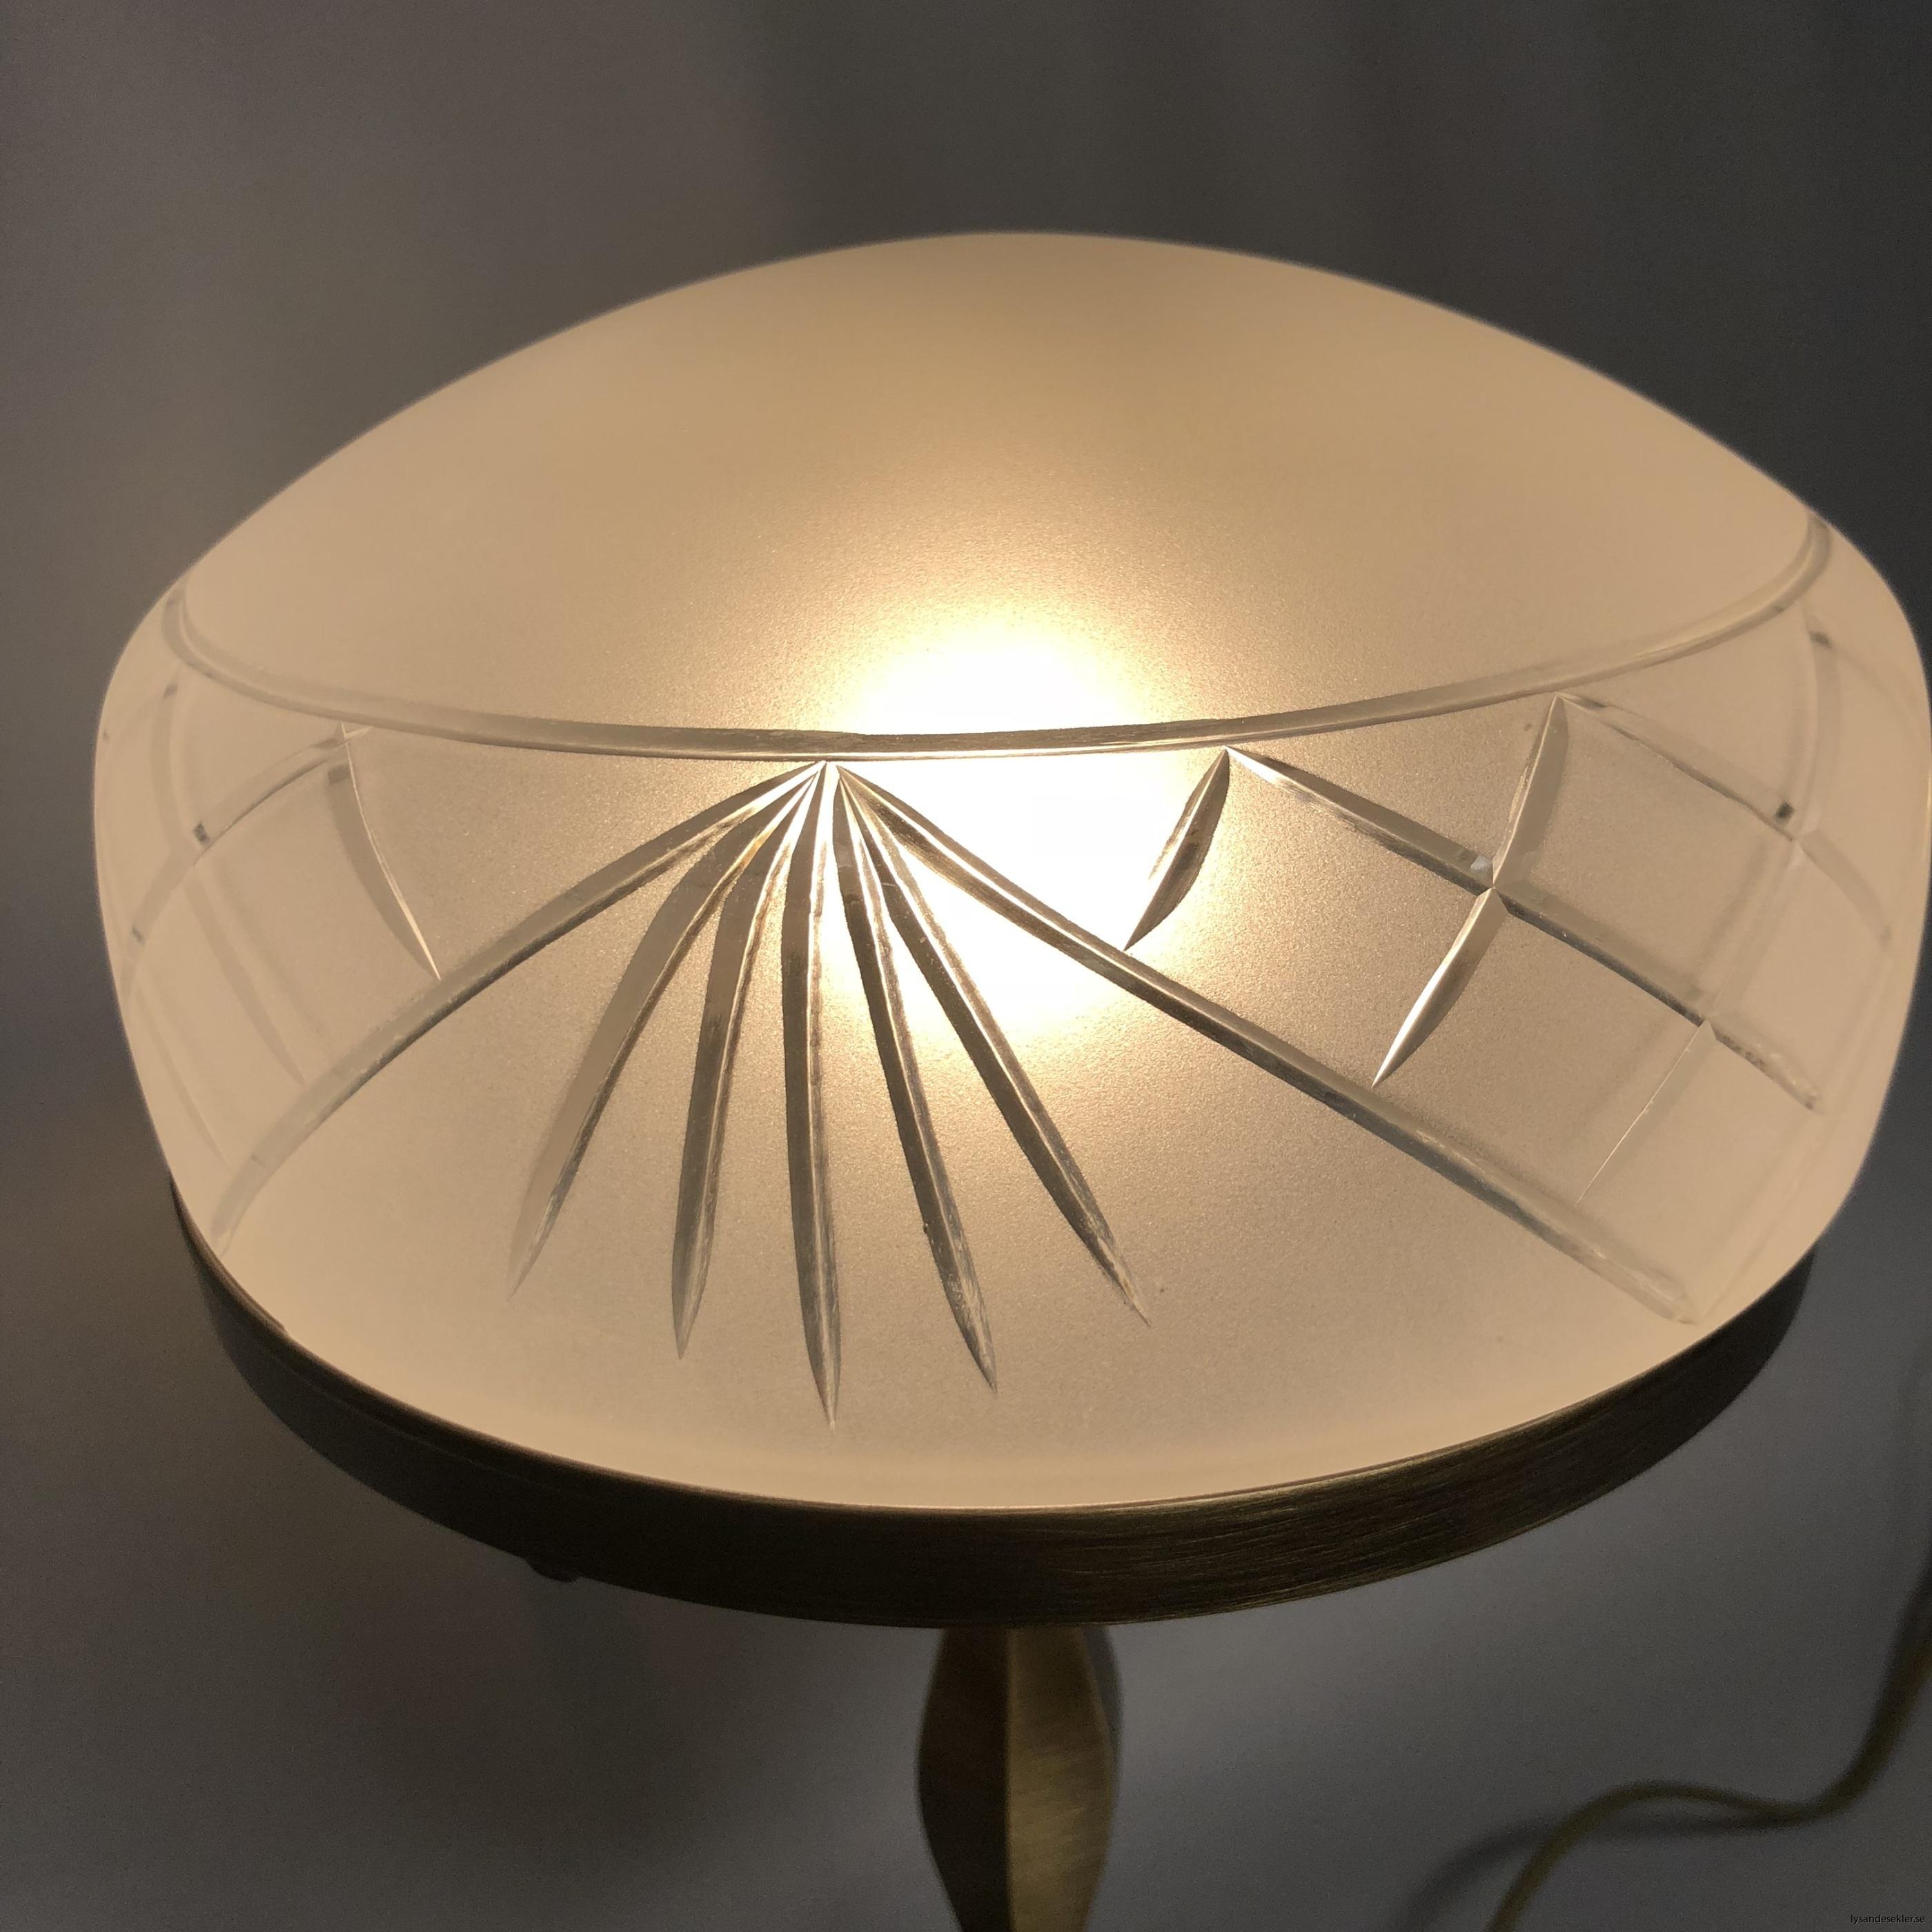 strindbergslampa strindbergslampor strindberg lampa skärm kupa strindbergsskärm strindbergskupa30